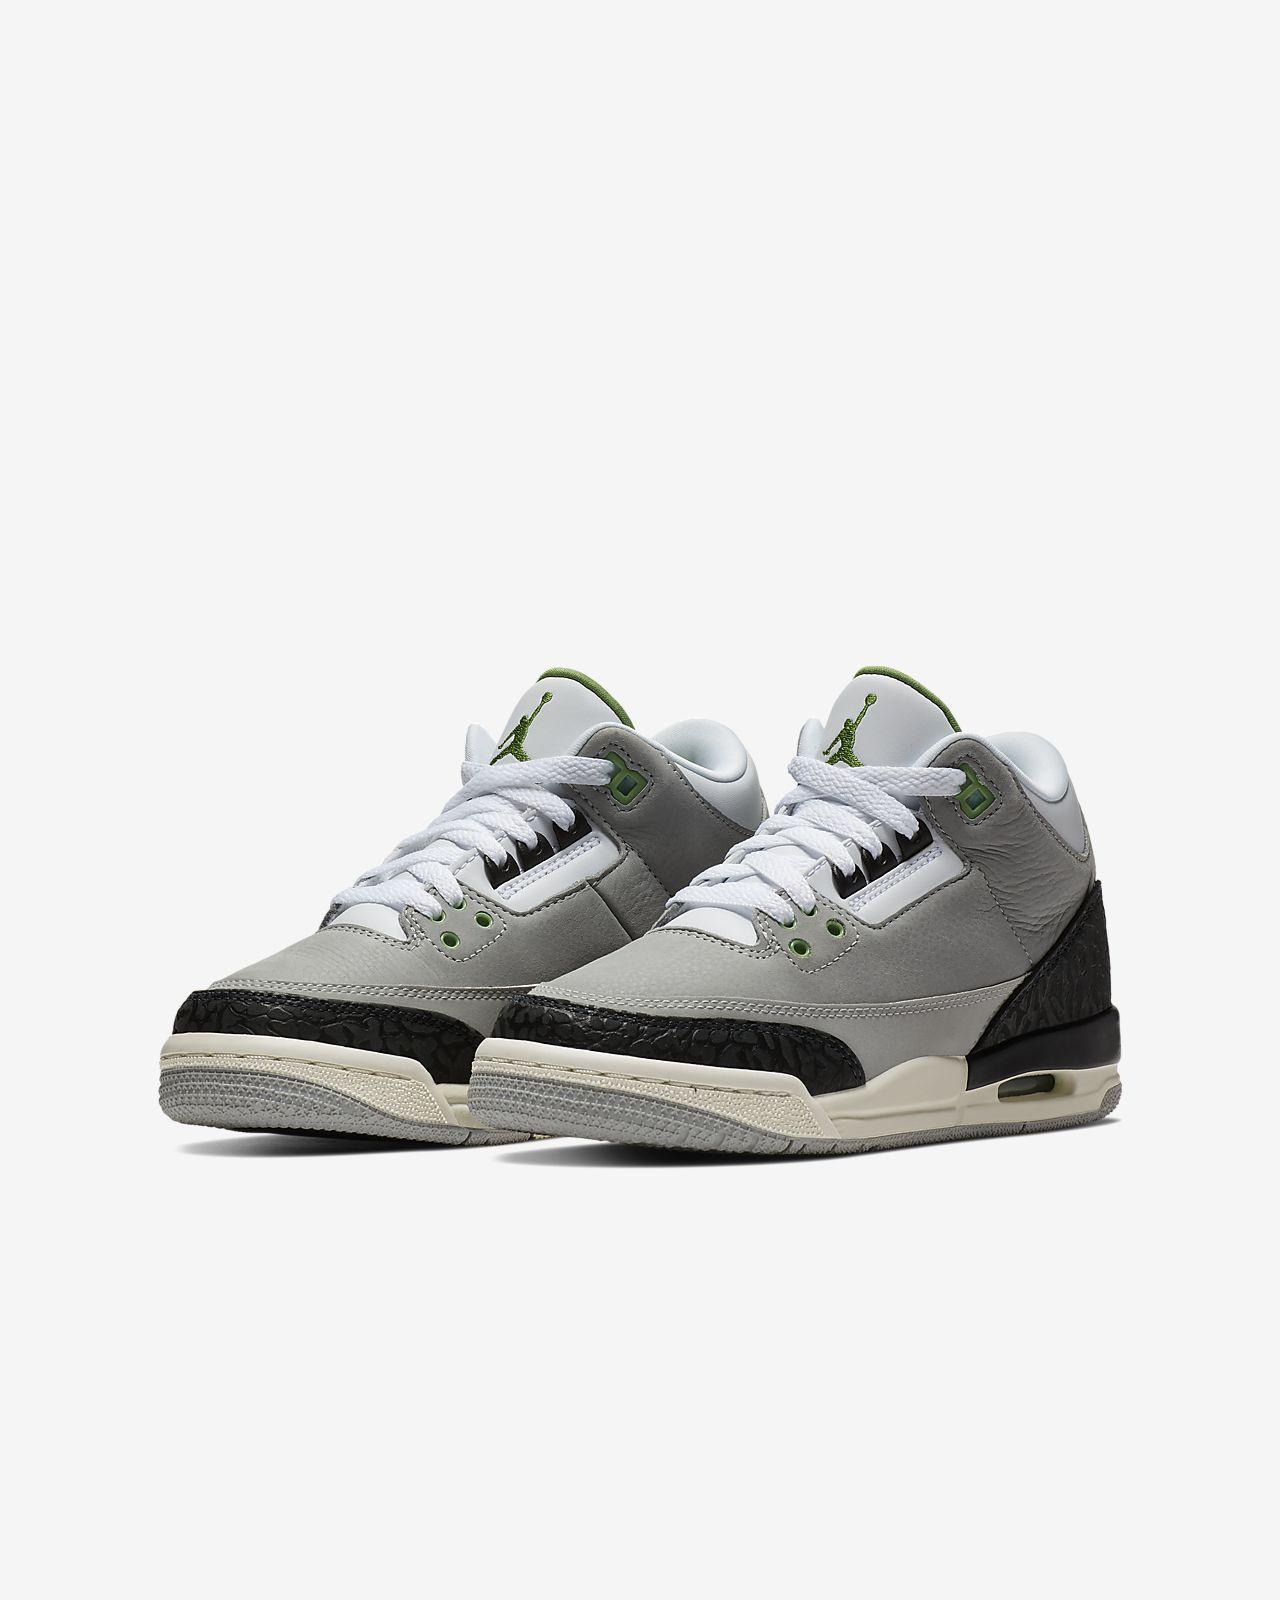 82bb123d3b650 Calzado para niños Air Jordan 3 Retro. Nike.com MX